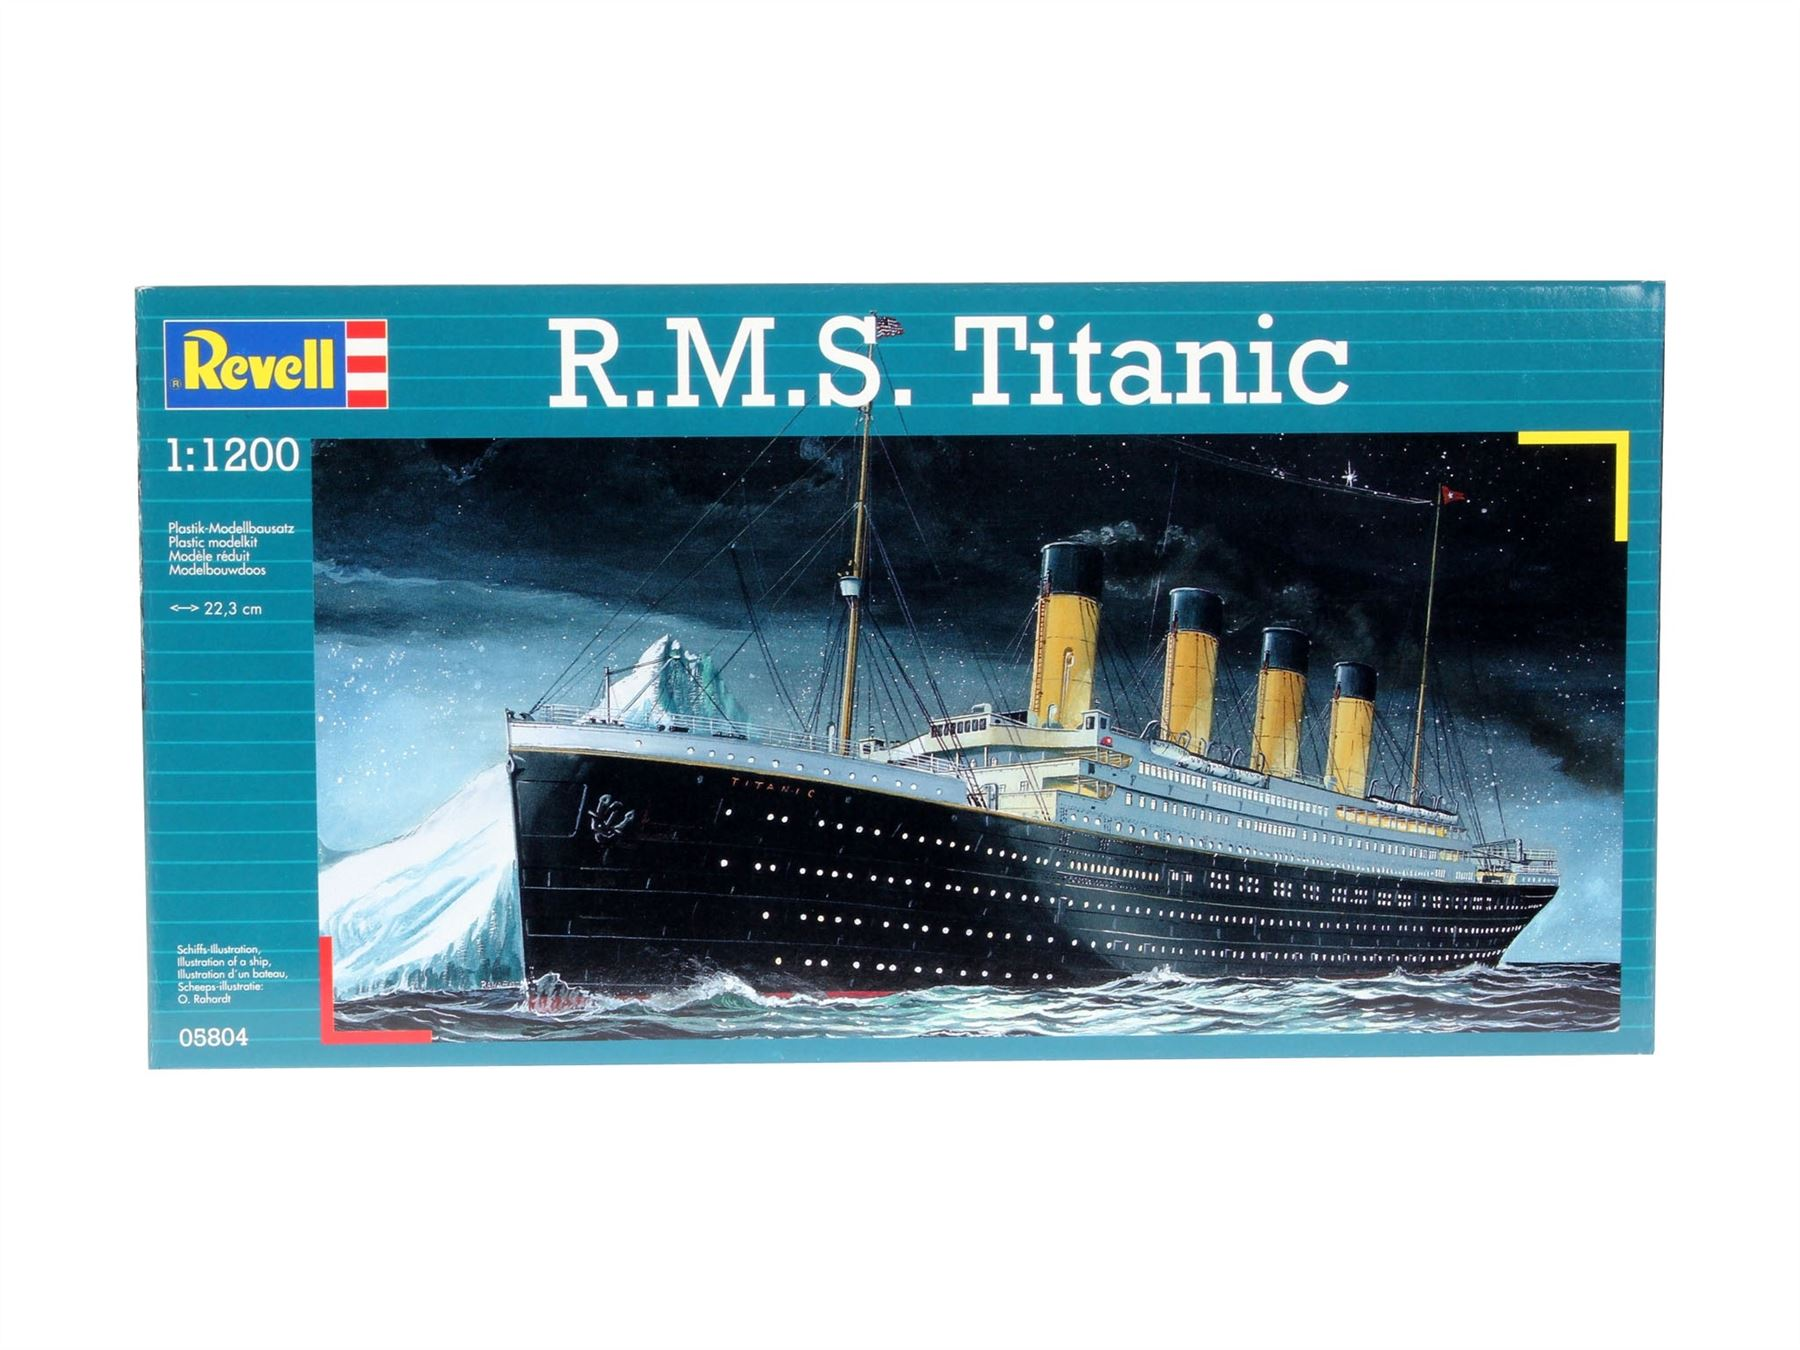 revell r m s titanic 1 1200 modell bausatz rev05804 ebay. Black Bedroom Furniture Sets. Home Design Ideas